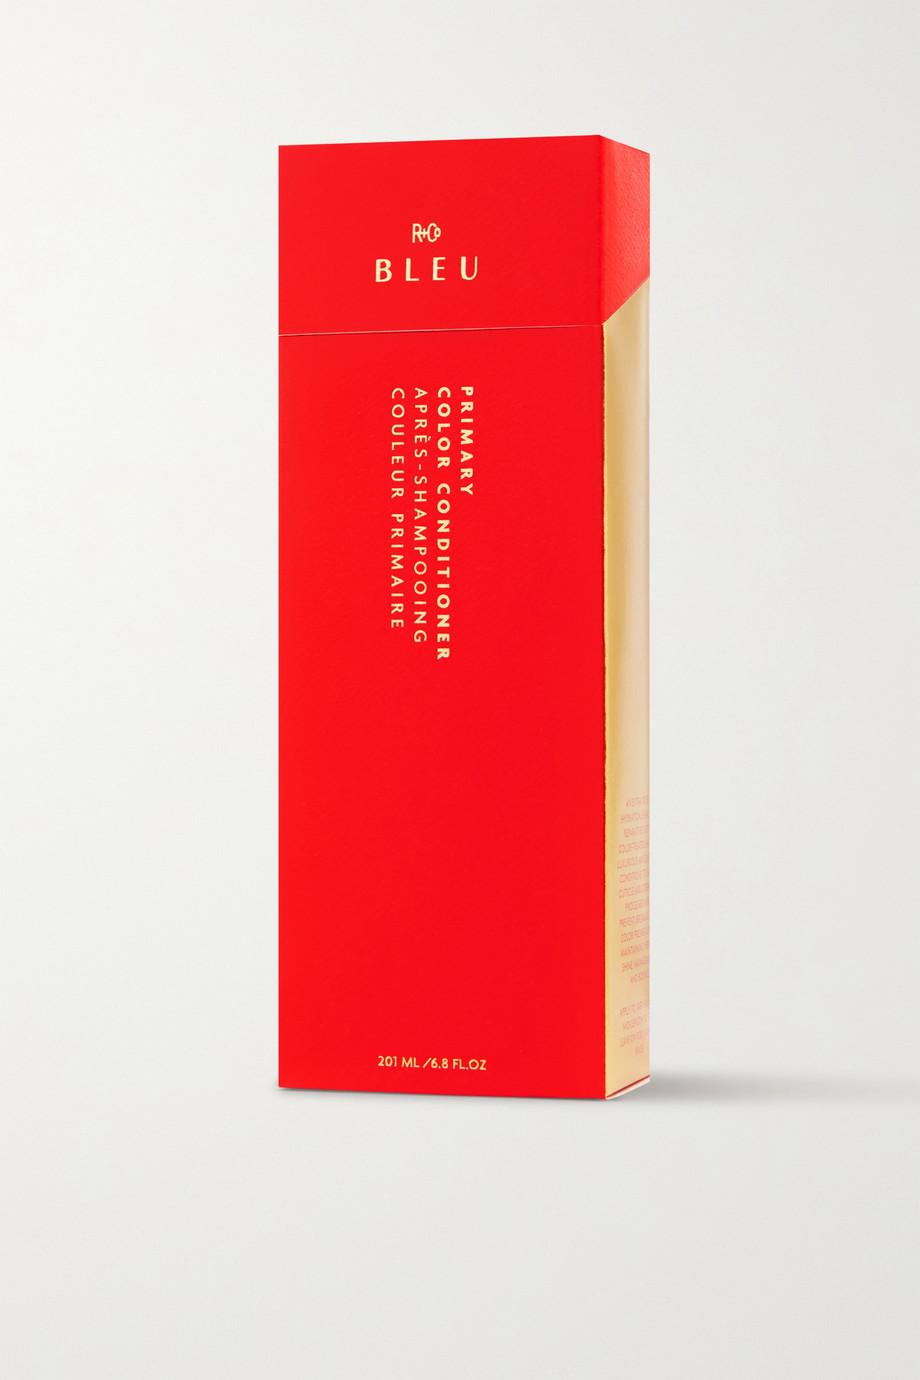 R+Co BLEU Primary Color Conditioner, 201ml